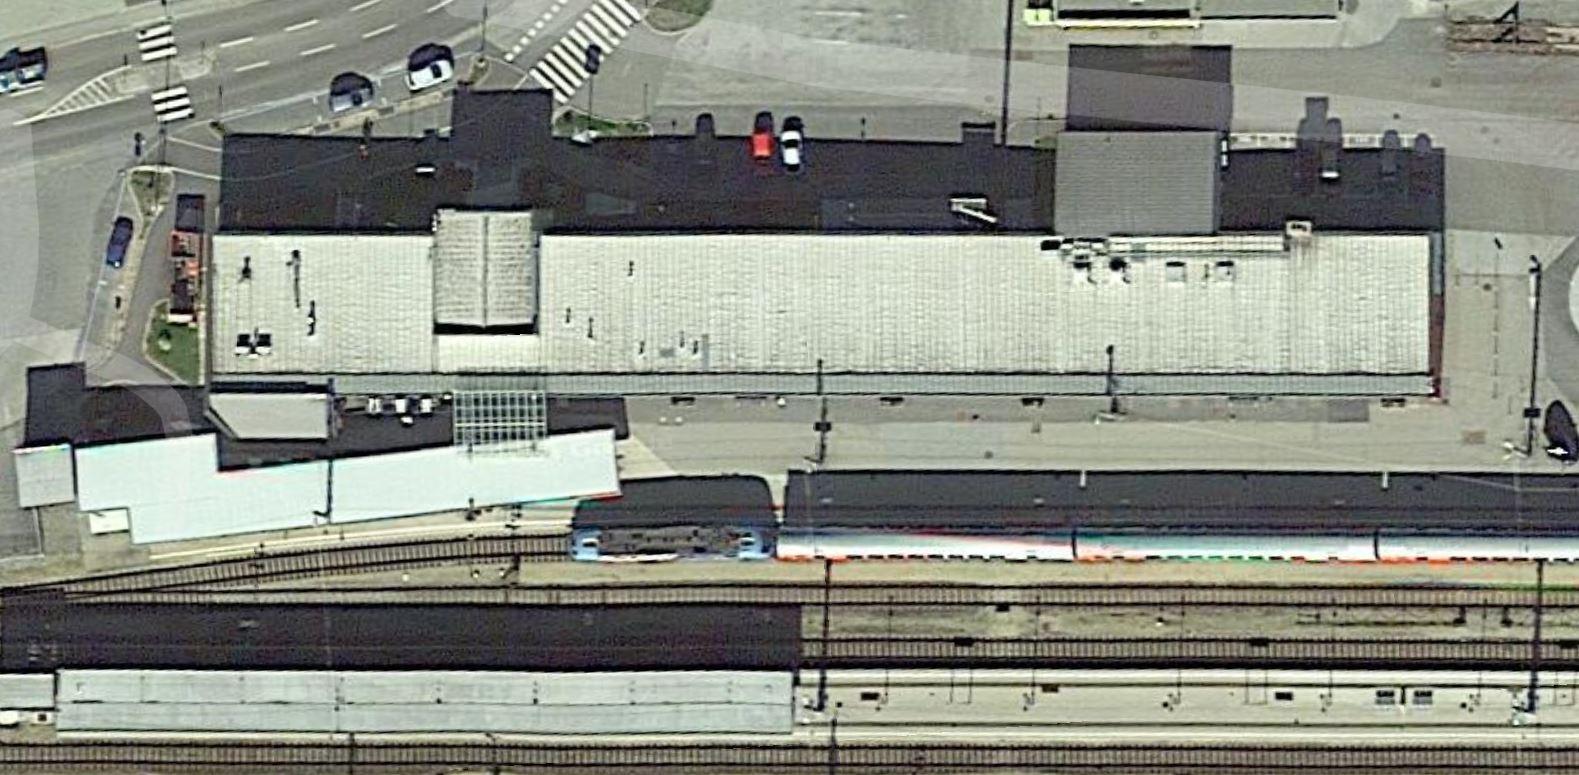 Bahnhof Gmünd Sattelitenbild, Quelle: Google Earth